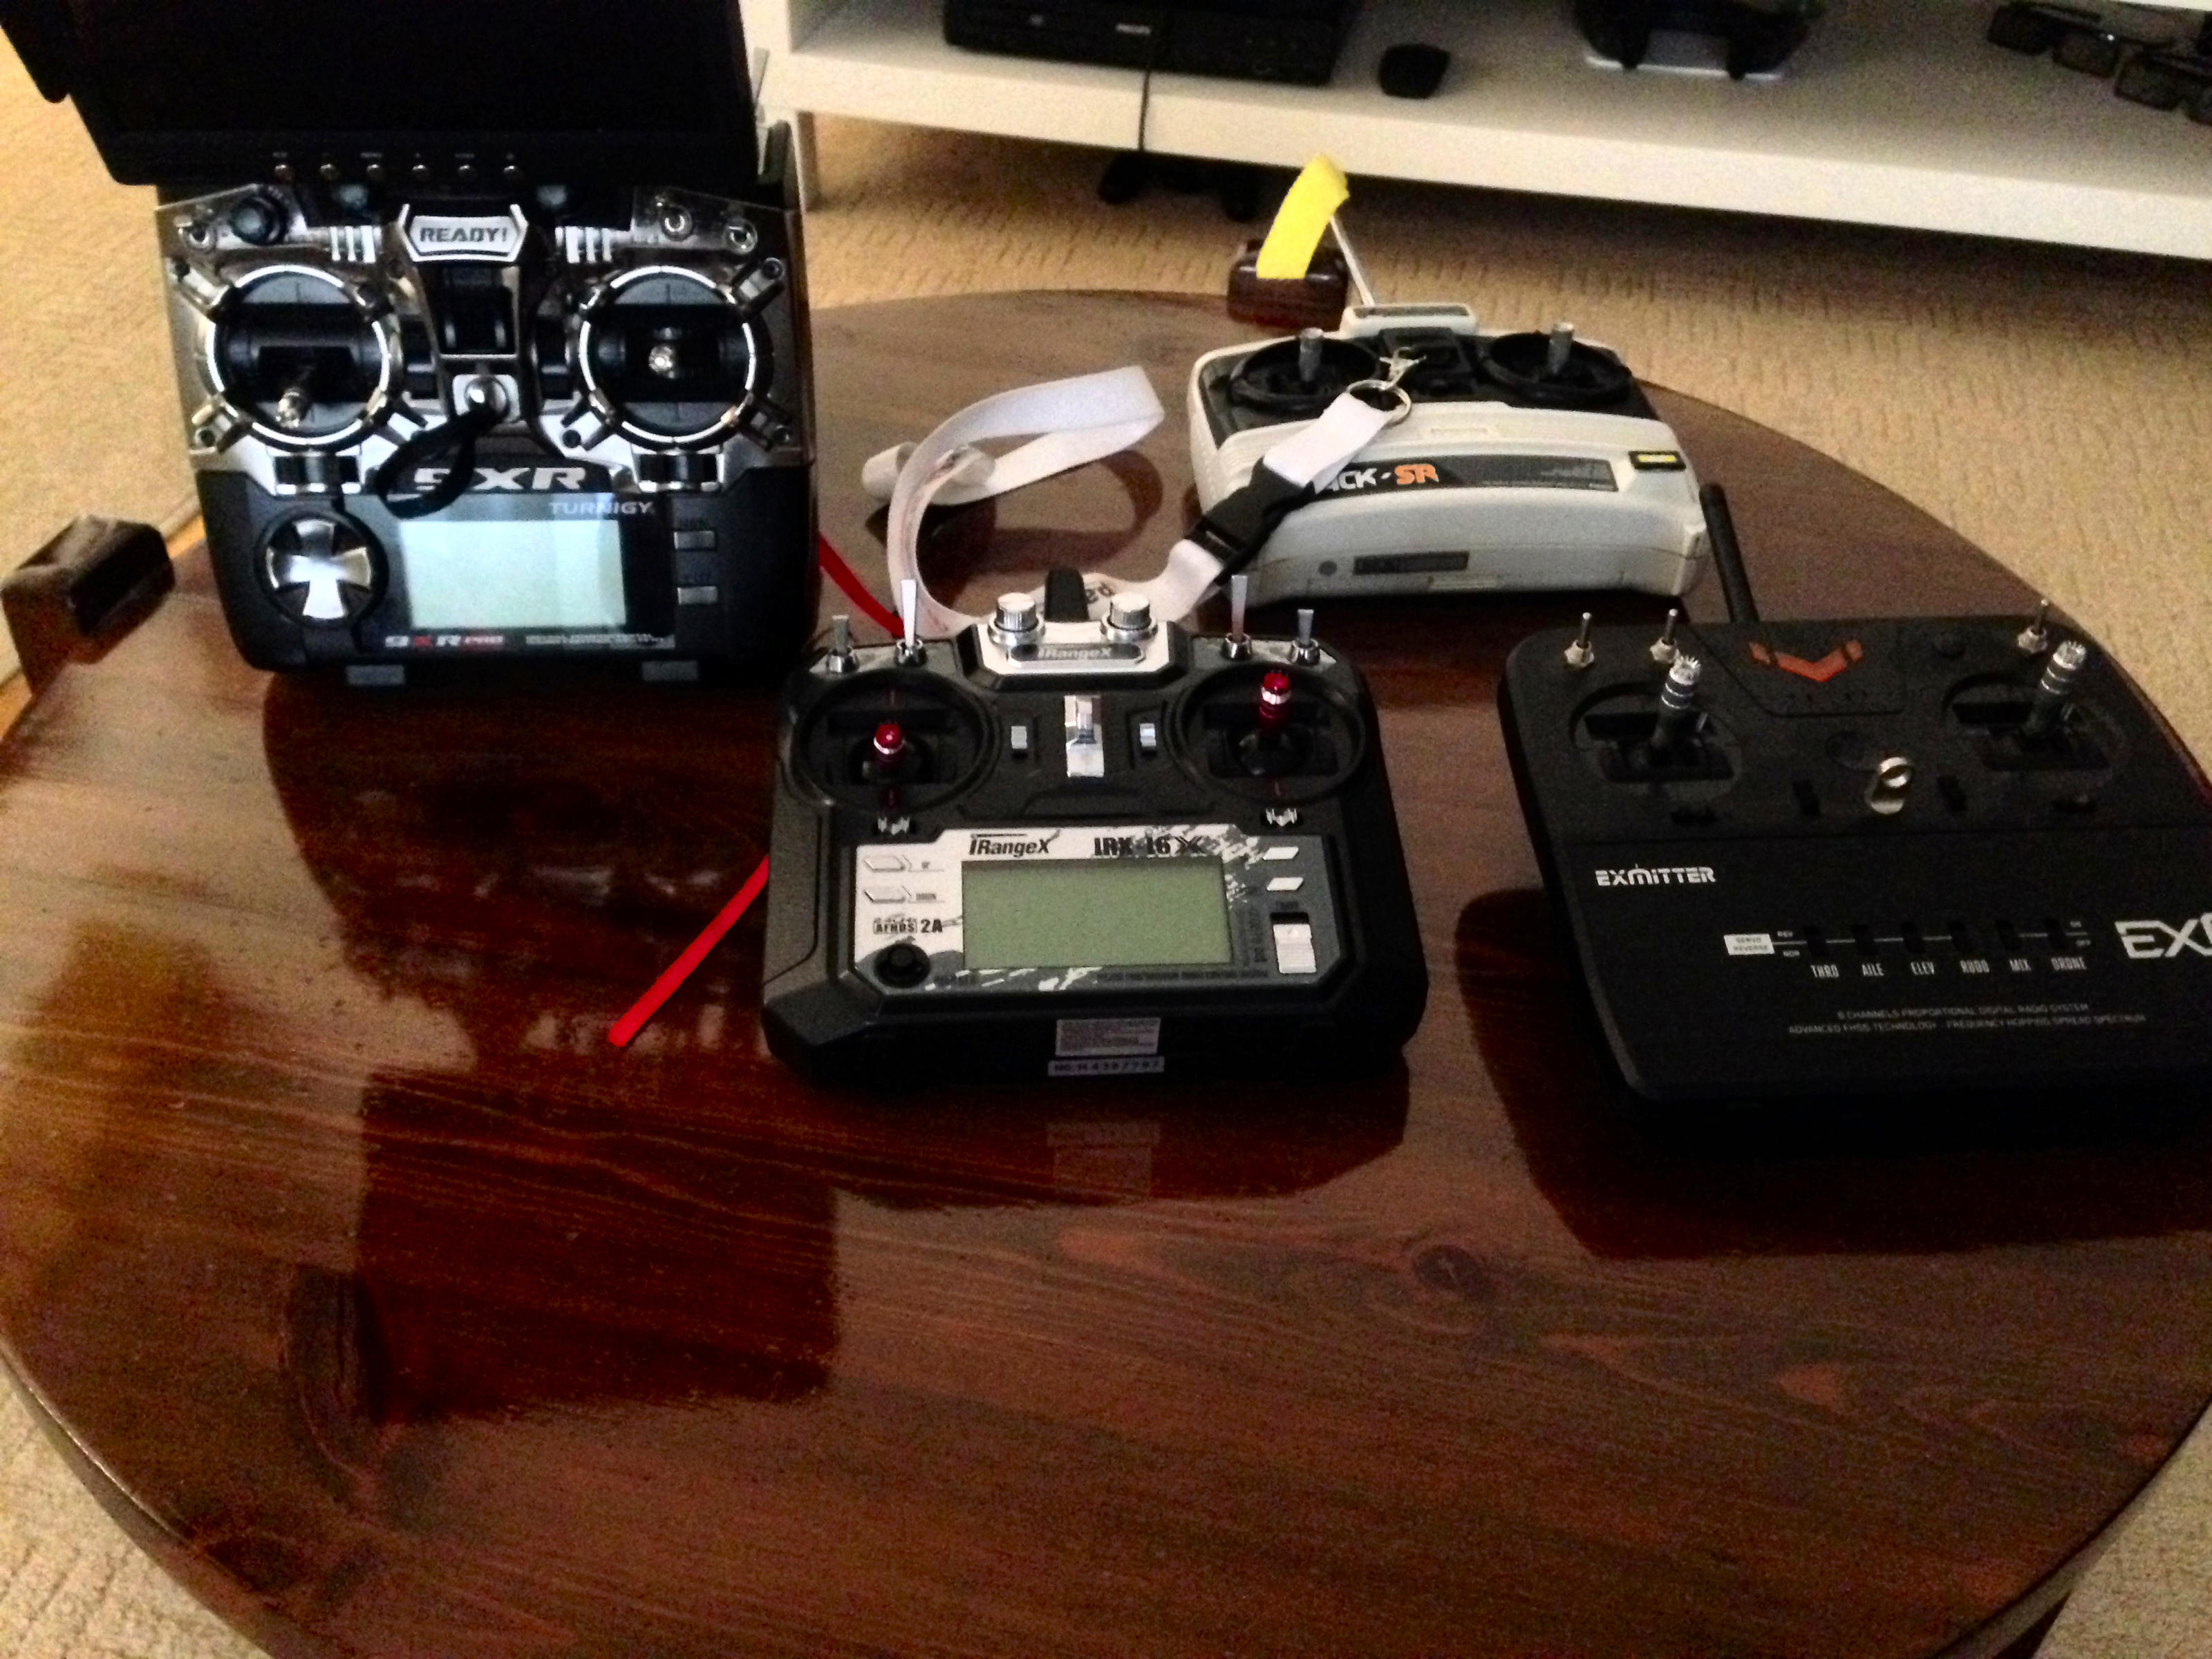 Irangex Irx I6x 24ghz 10ch Transmitter Wattflyer Rc Electric Old Airtronics Servos Flight Forums Discuss Unboxing Video Will Follow